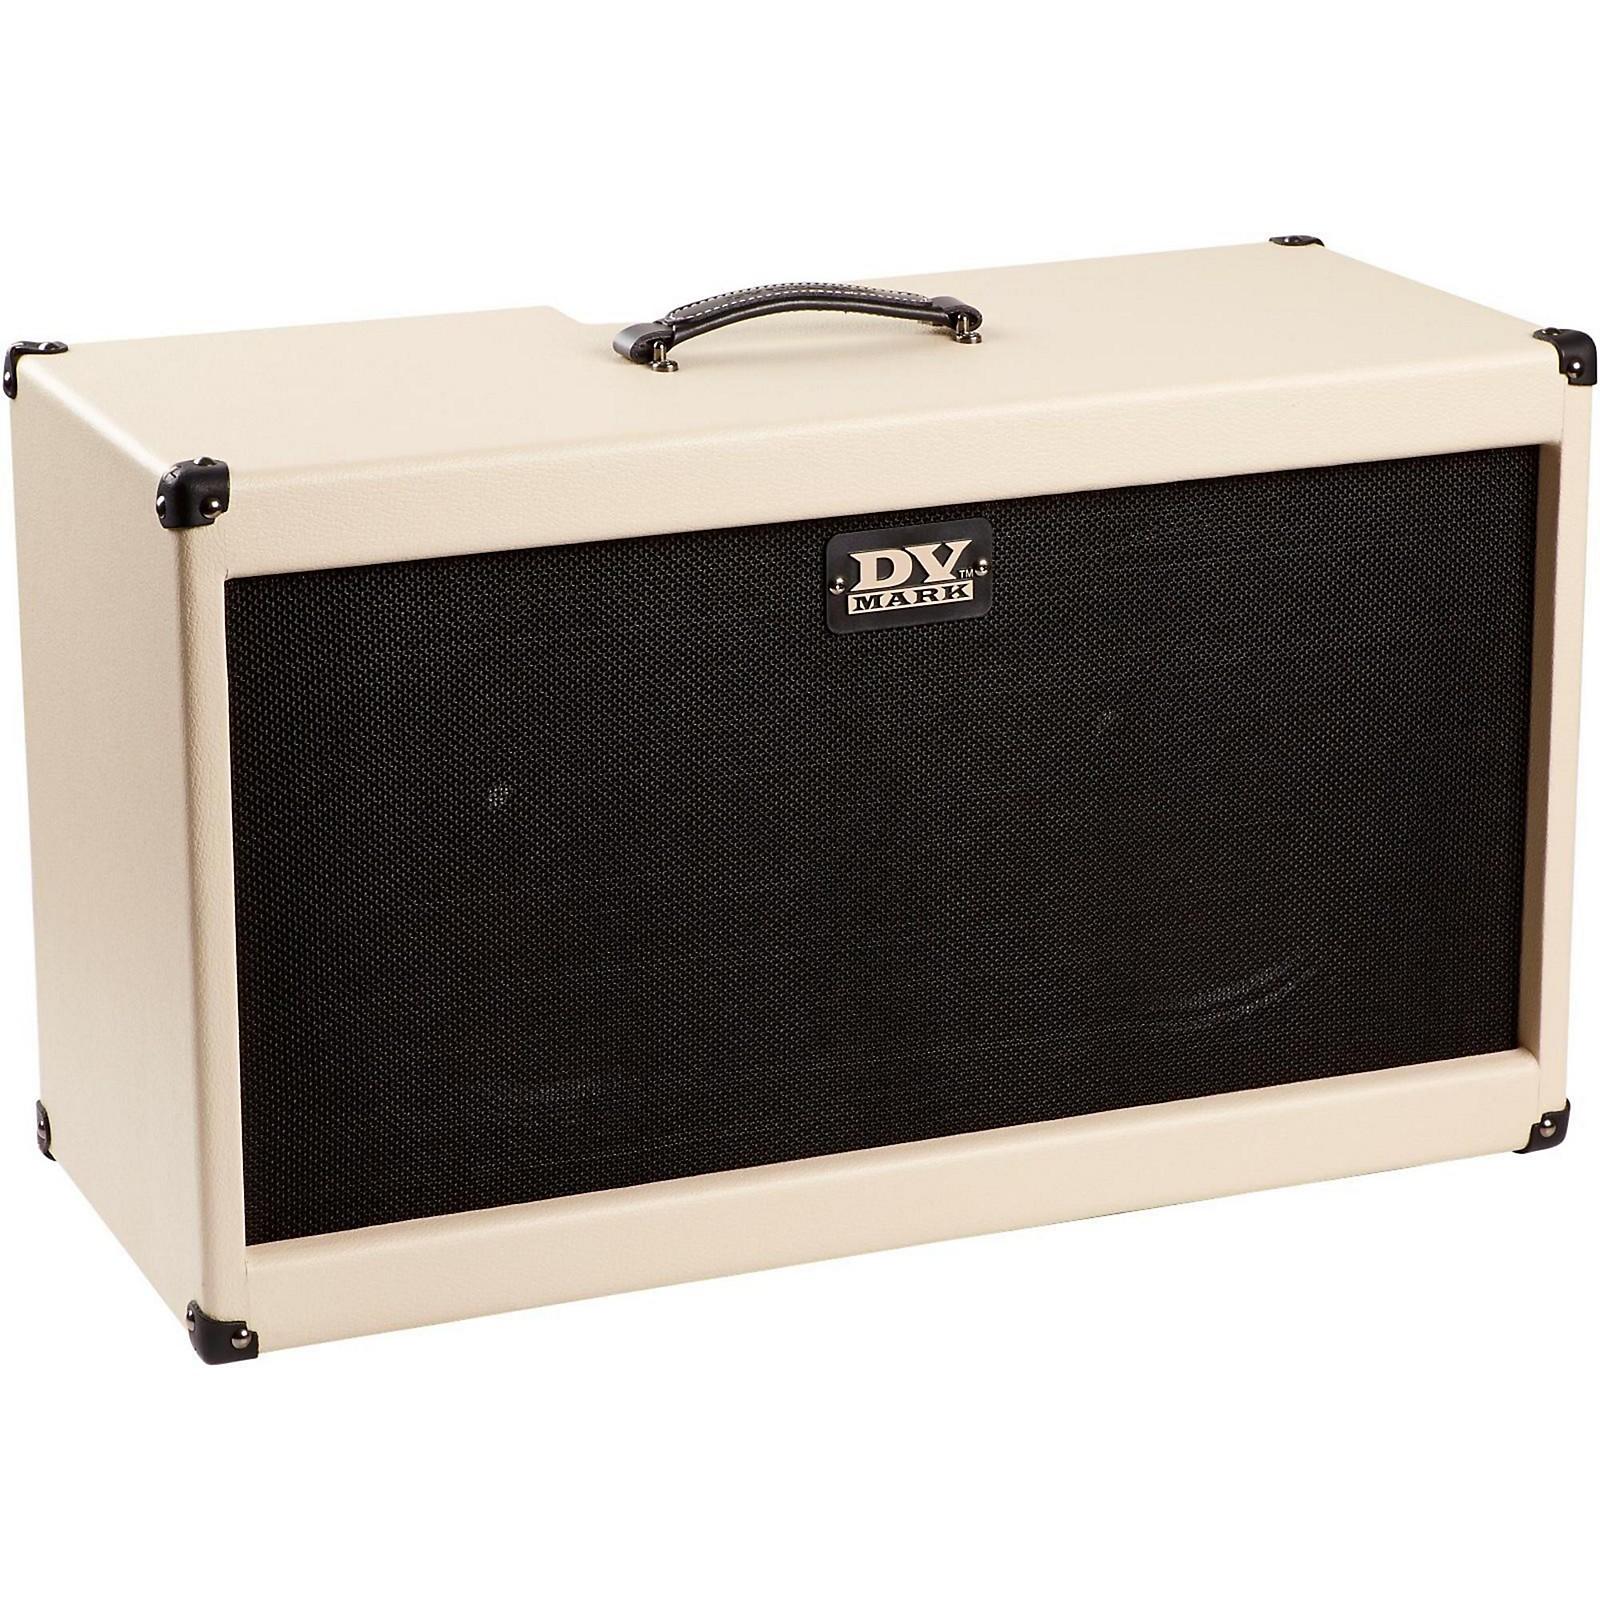 Open Box DV Mark Jazz212 50W 2x12 Guitar Combo Amp